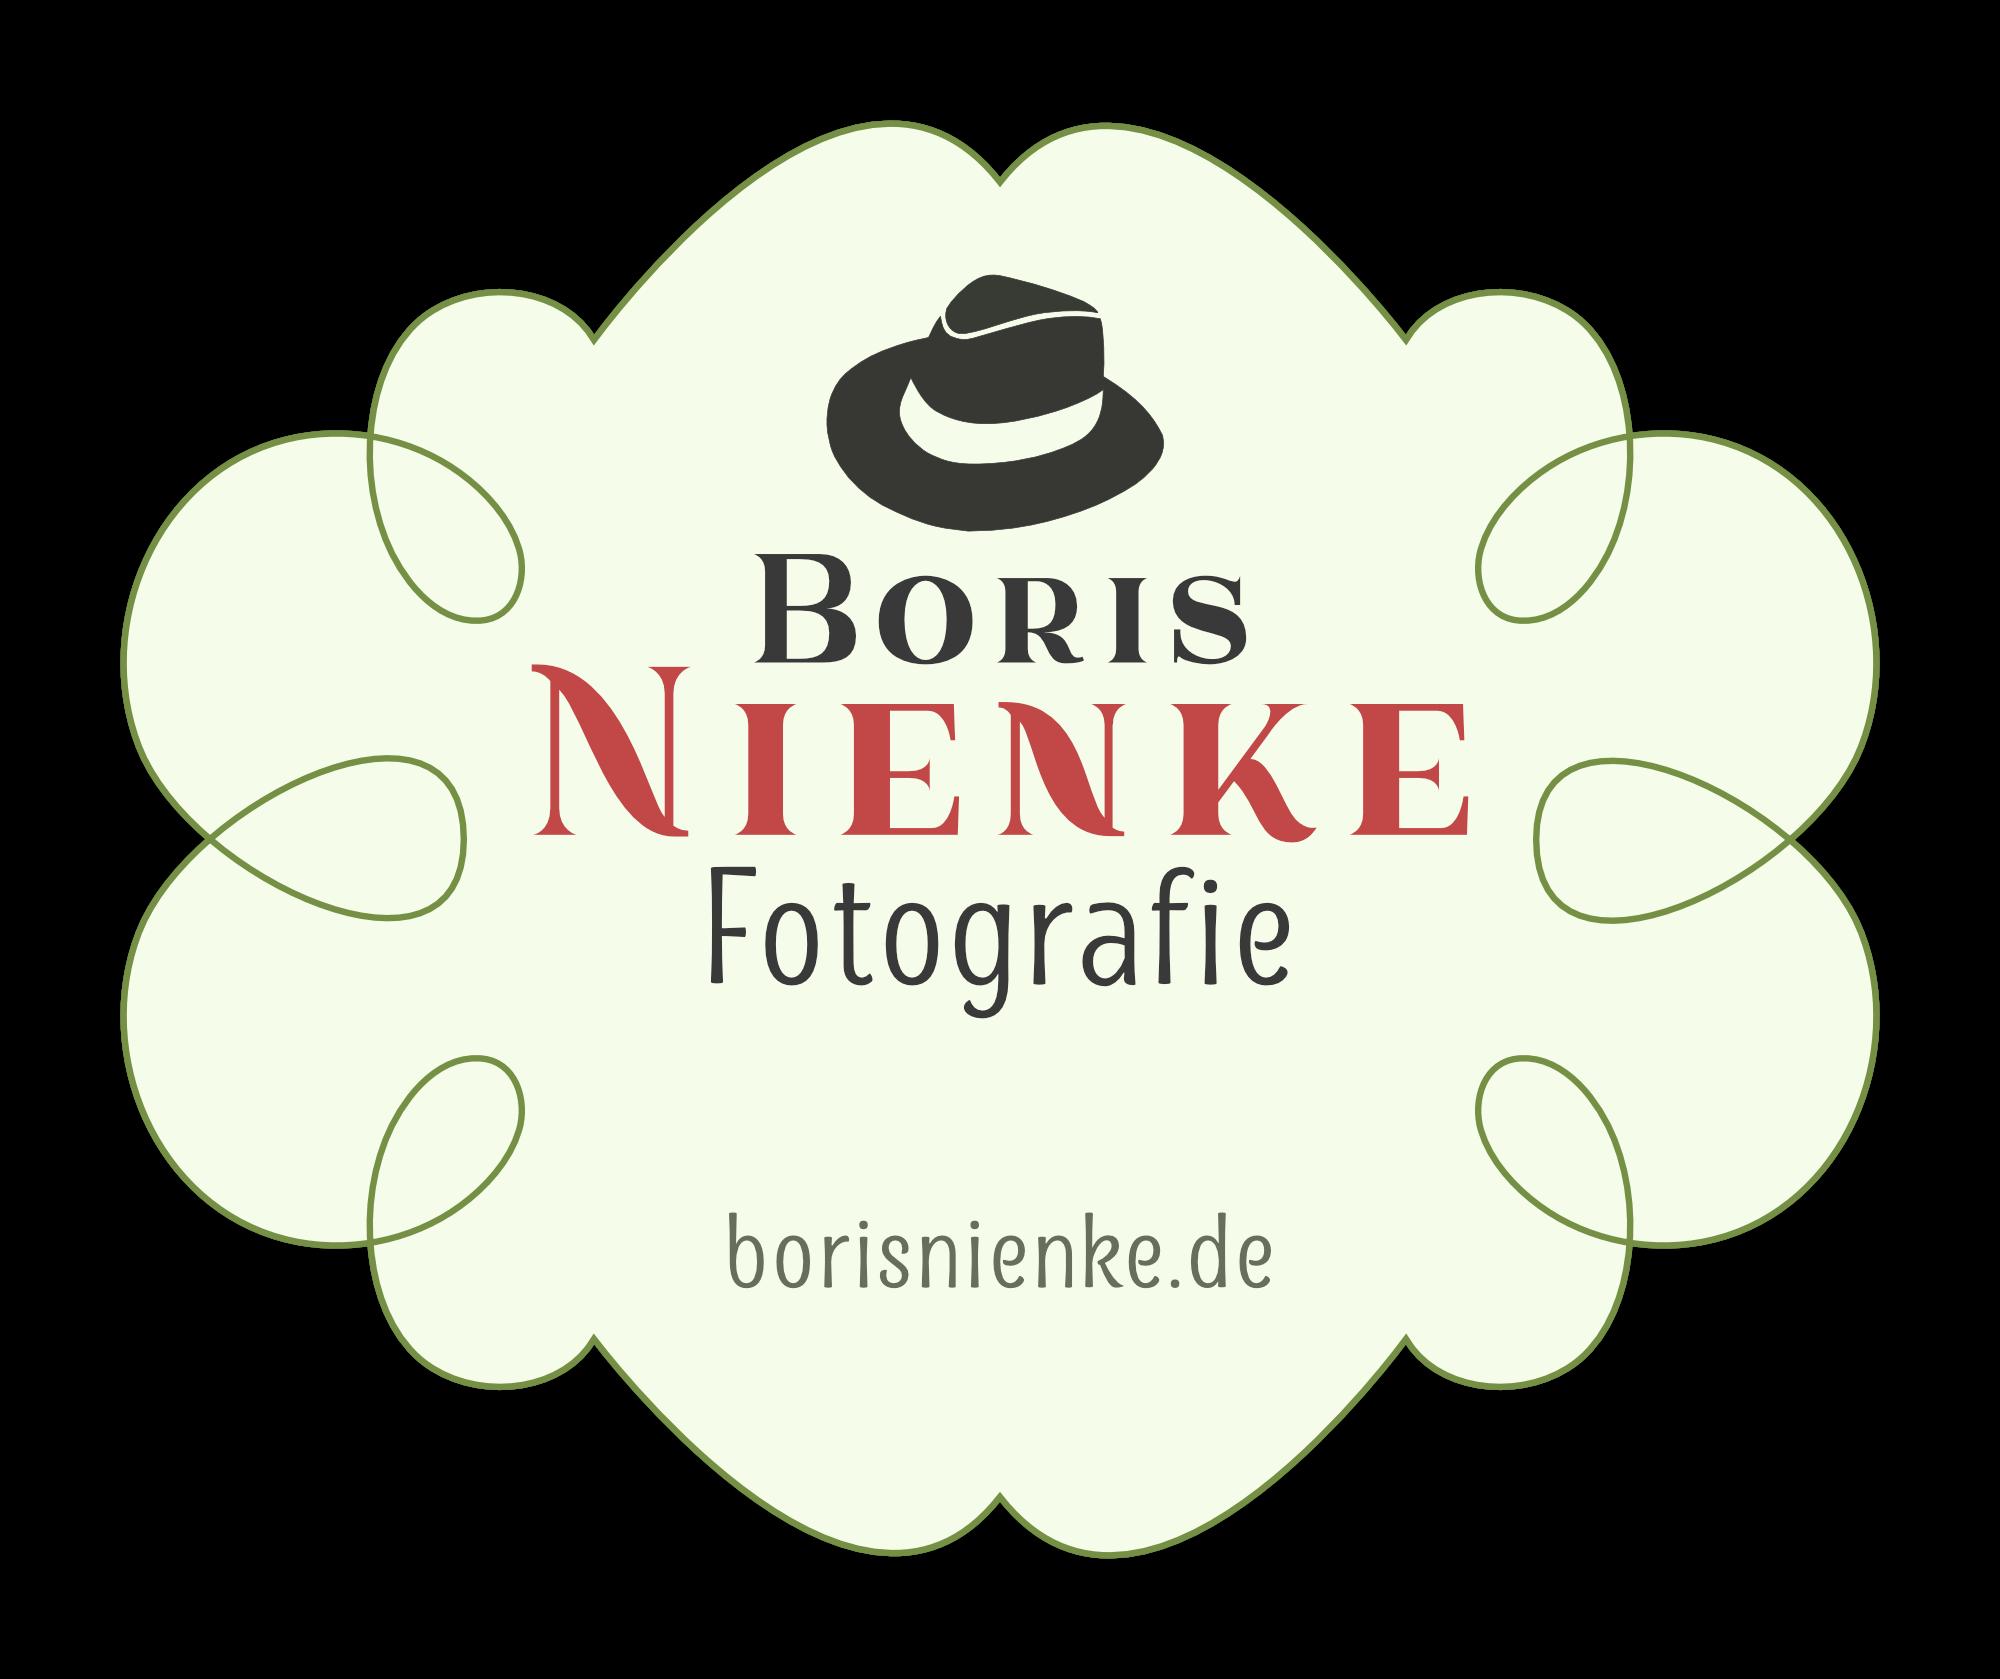 Boris Nienke Fotografie Logo Badge